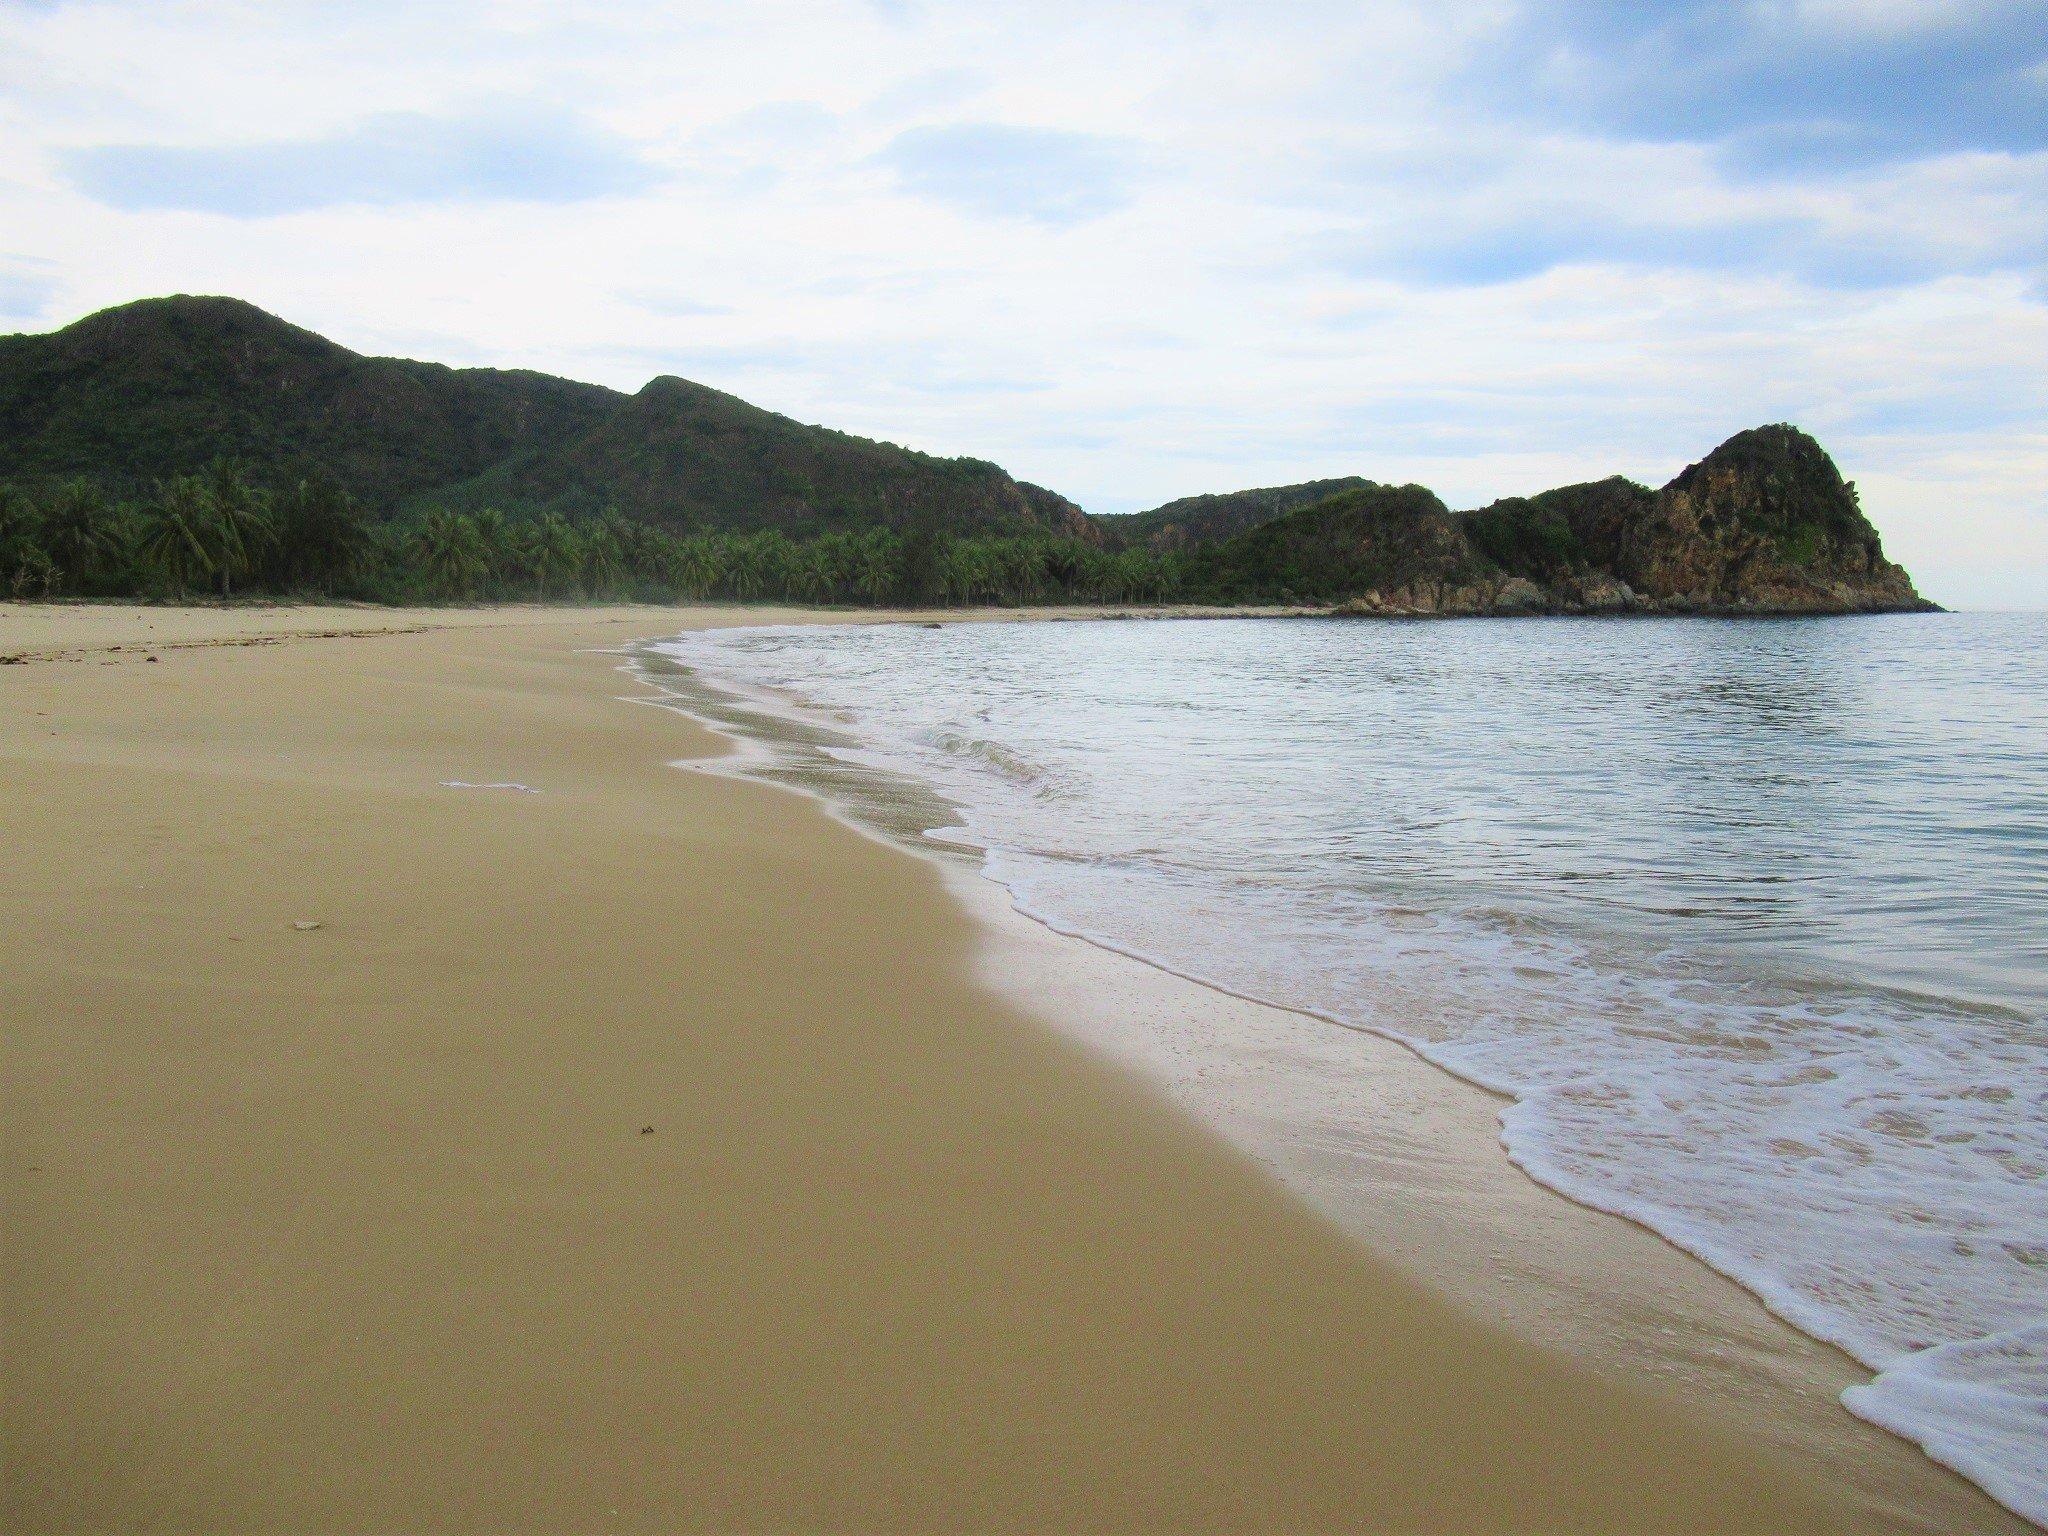 Bai Om Beach, Phu Yen Province, Vietnam